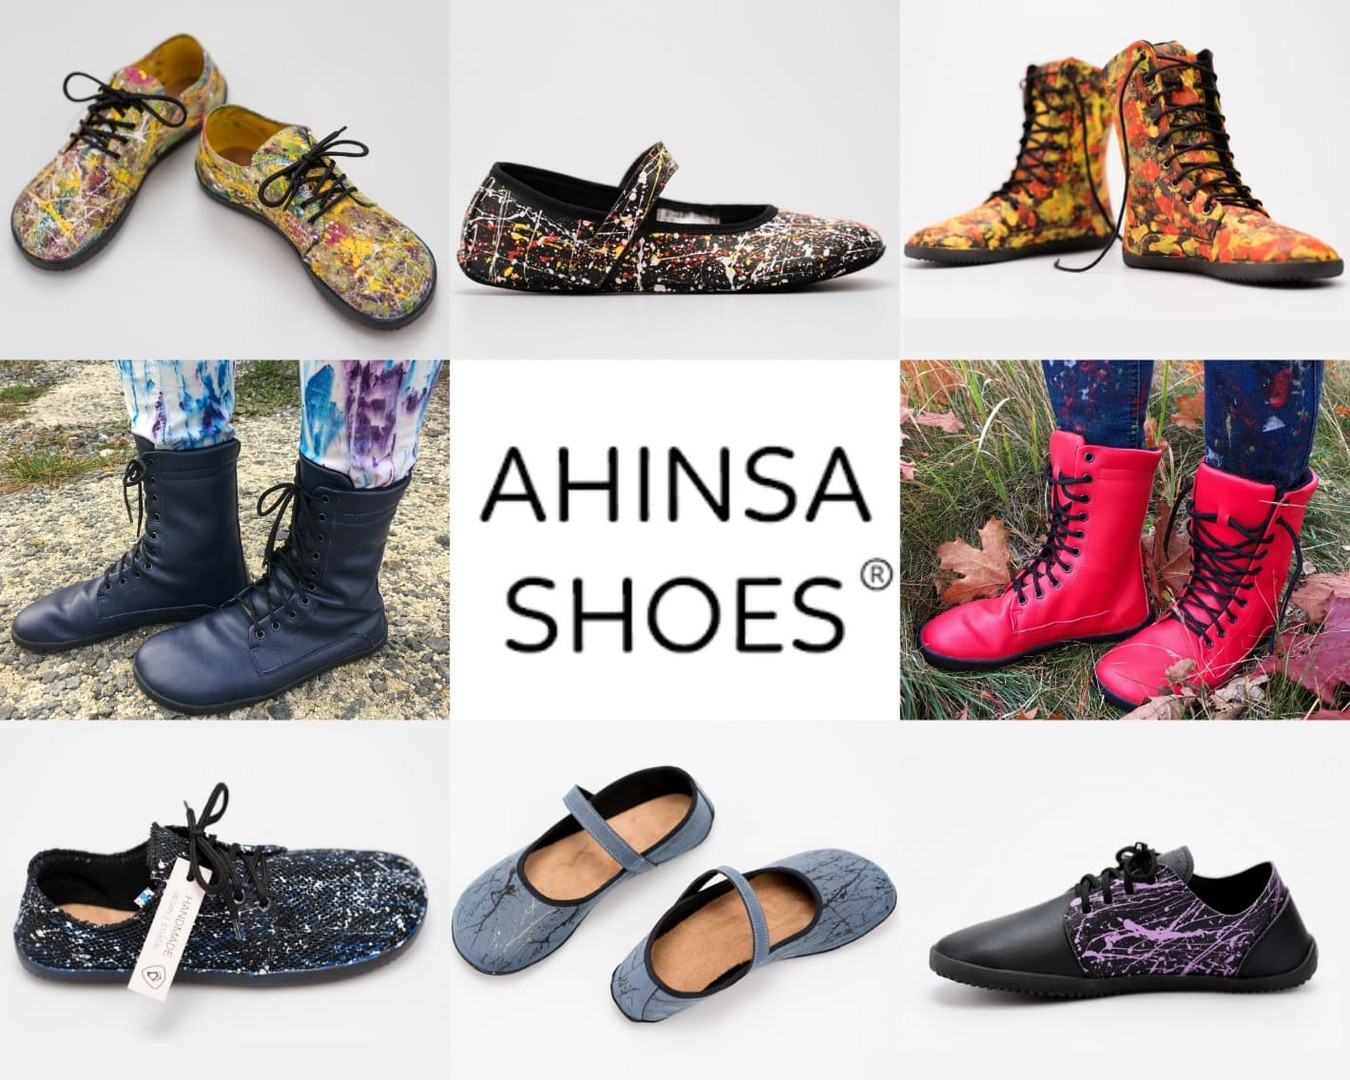 Ahinsa shoes®